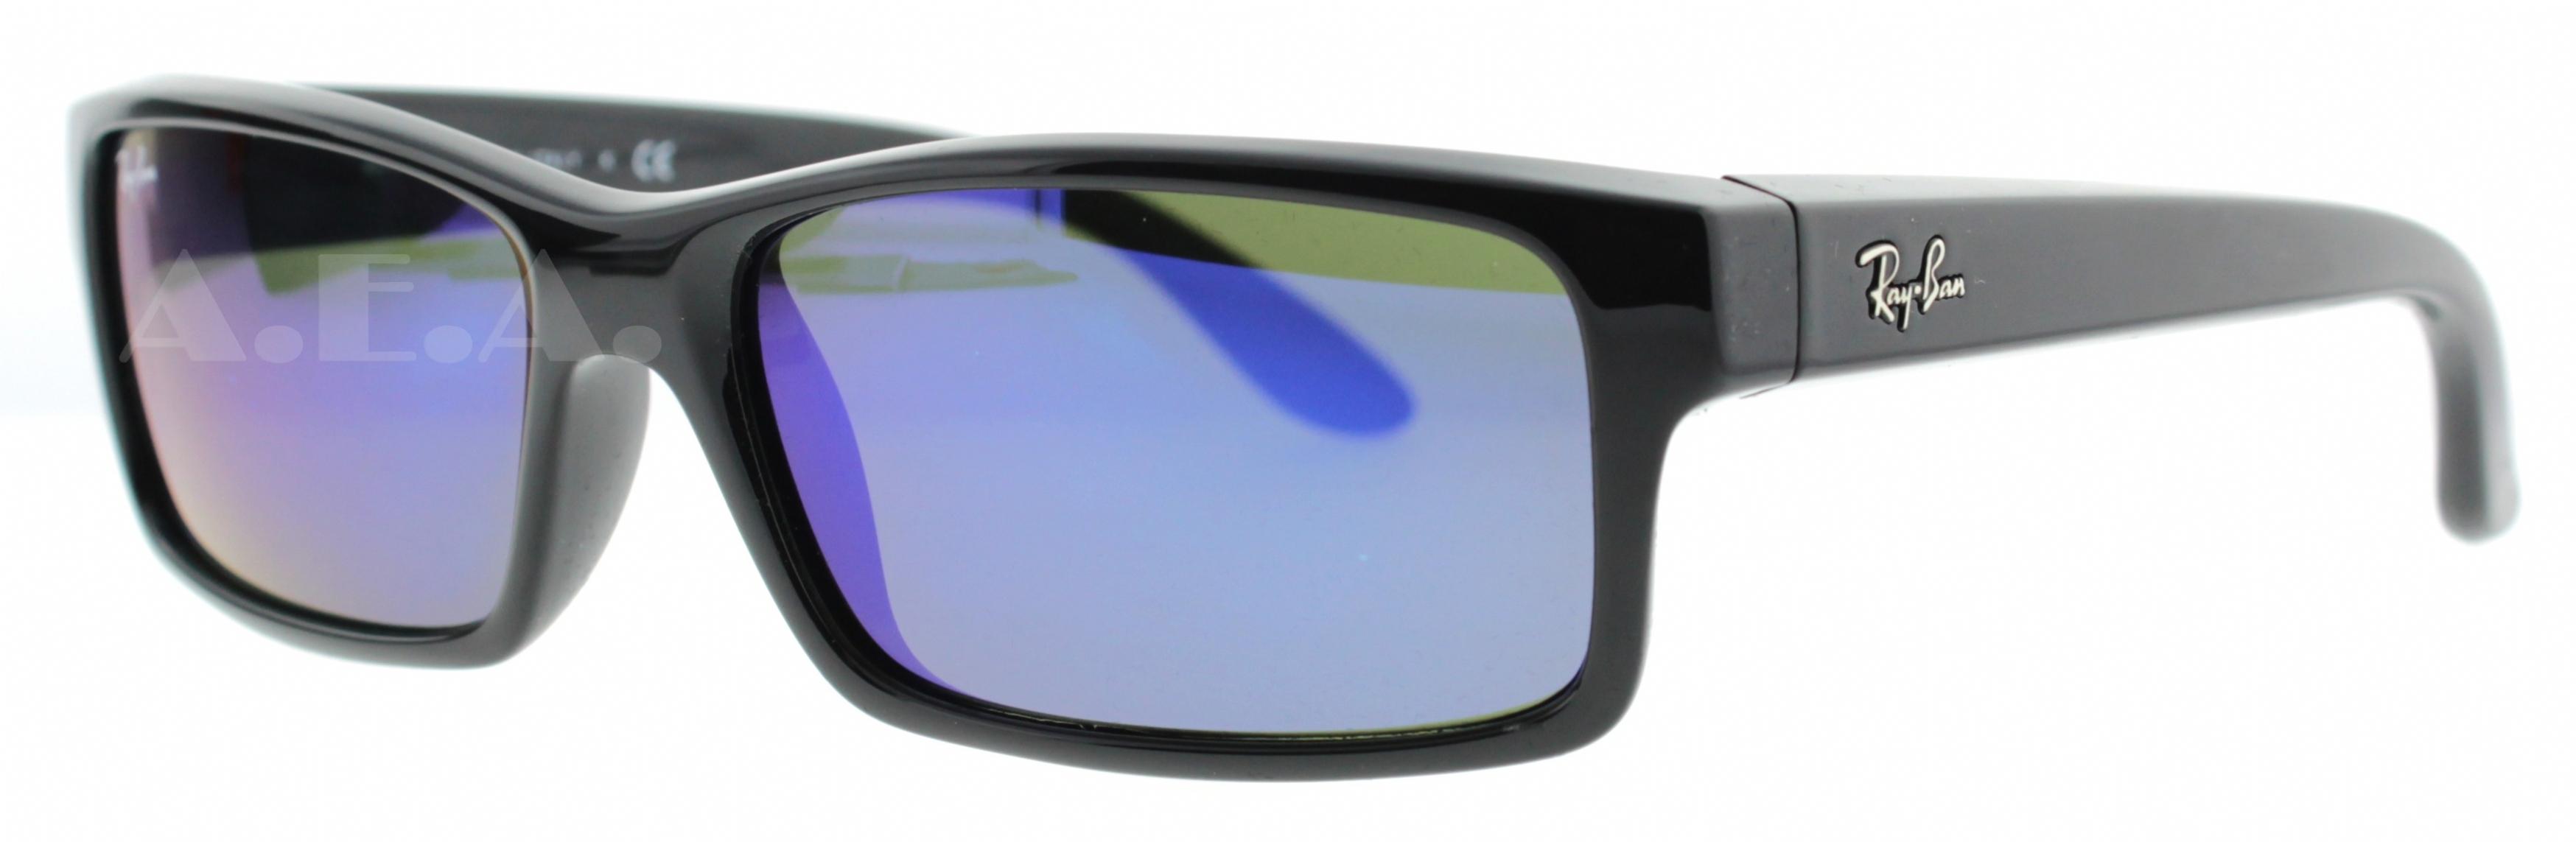 ec5c205132d Ray Ban 4151 Sunglasses